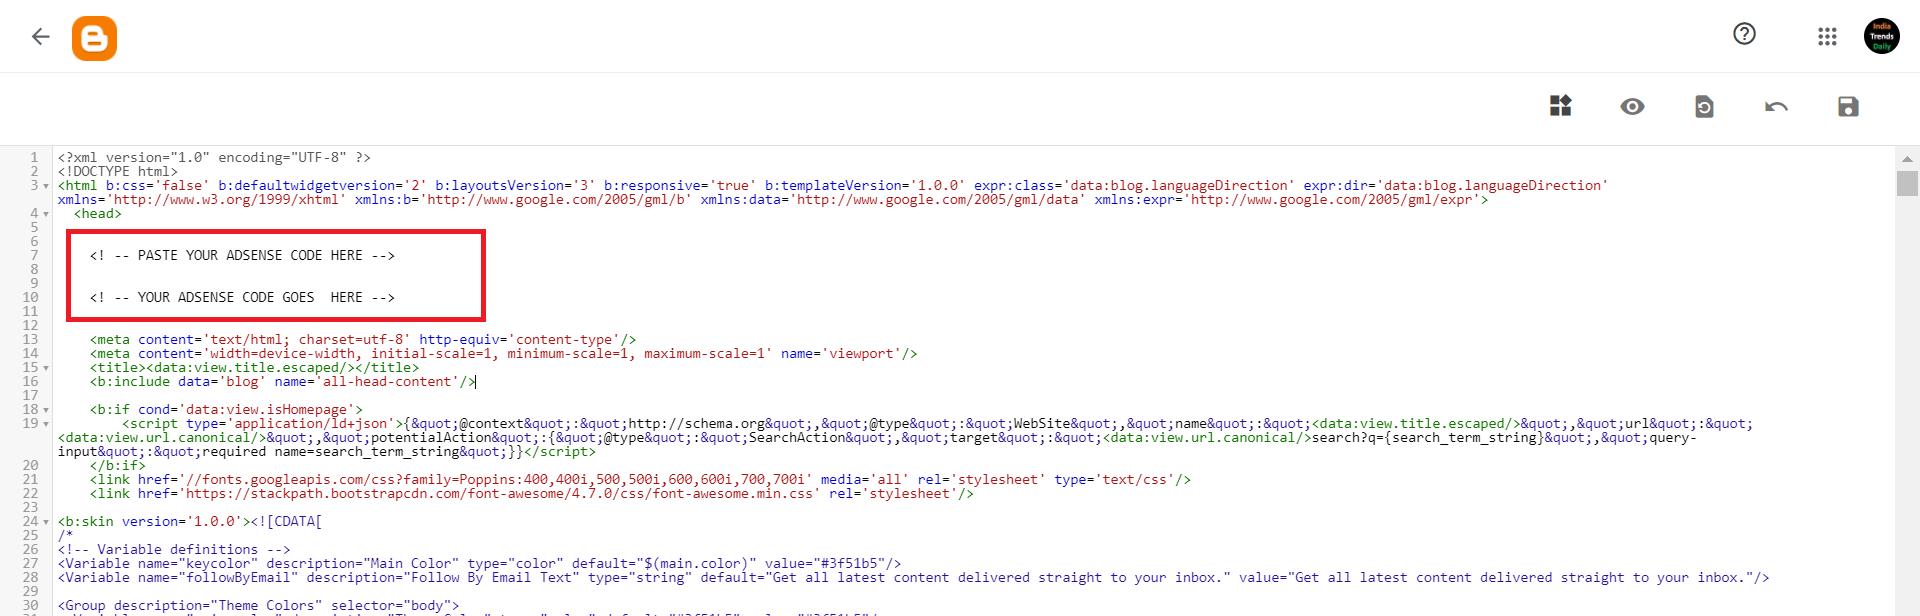 google adsense place html code